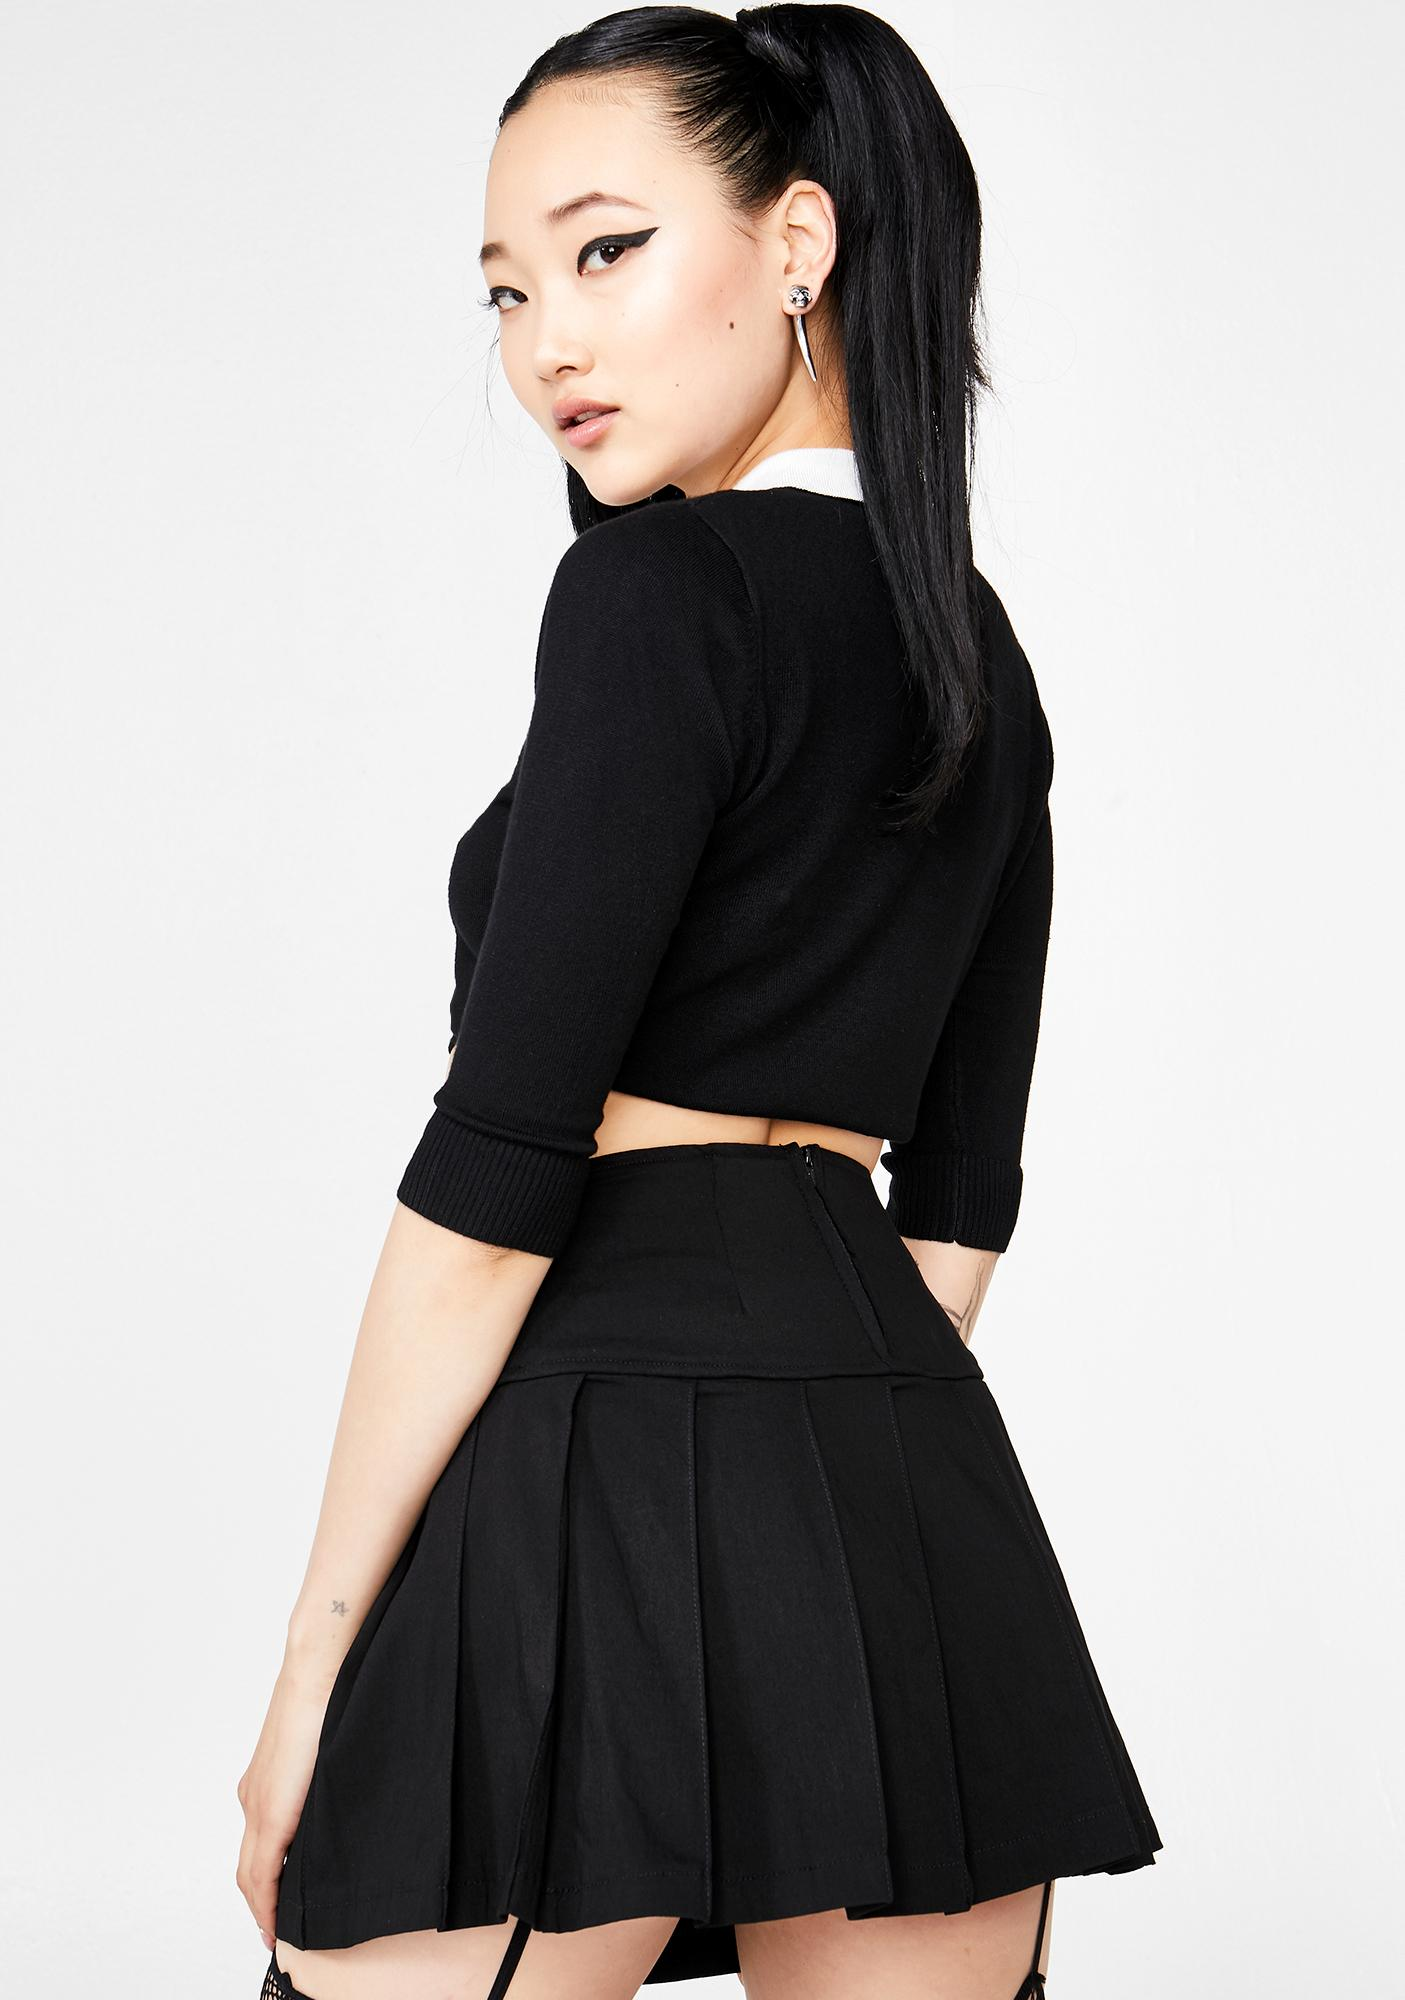 Show Some Restraint Buckle Skirt